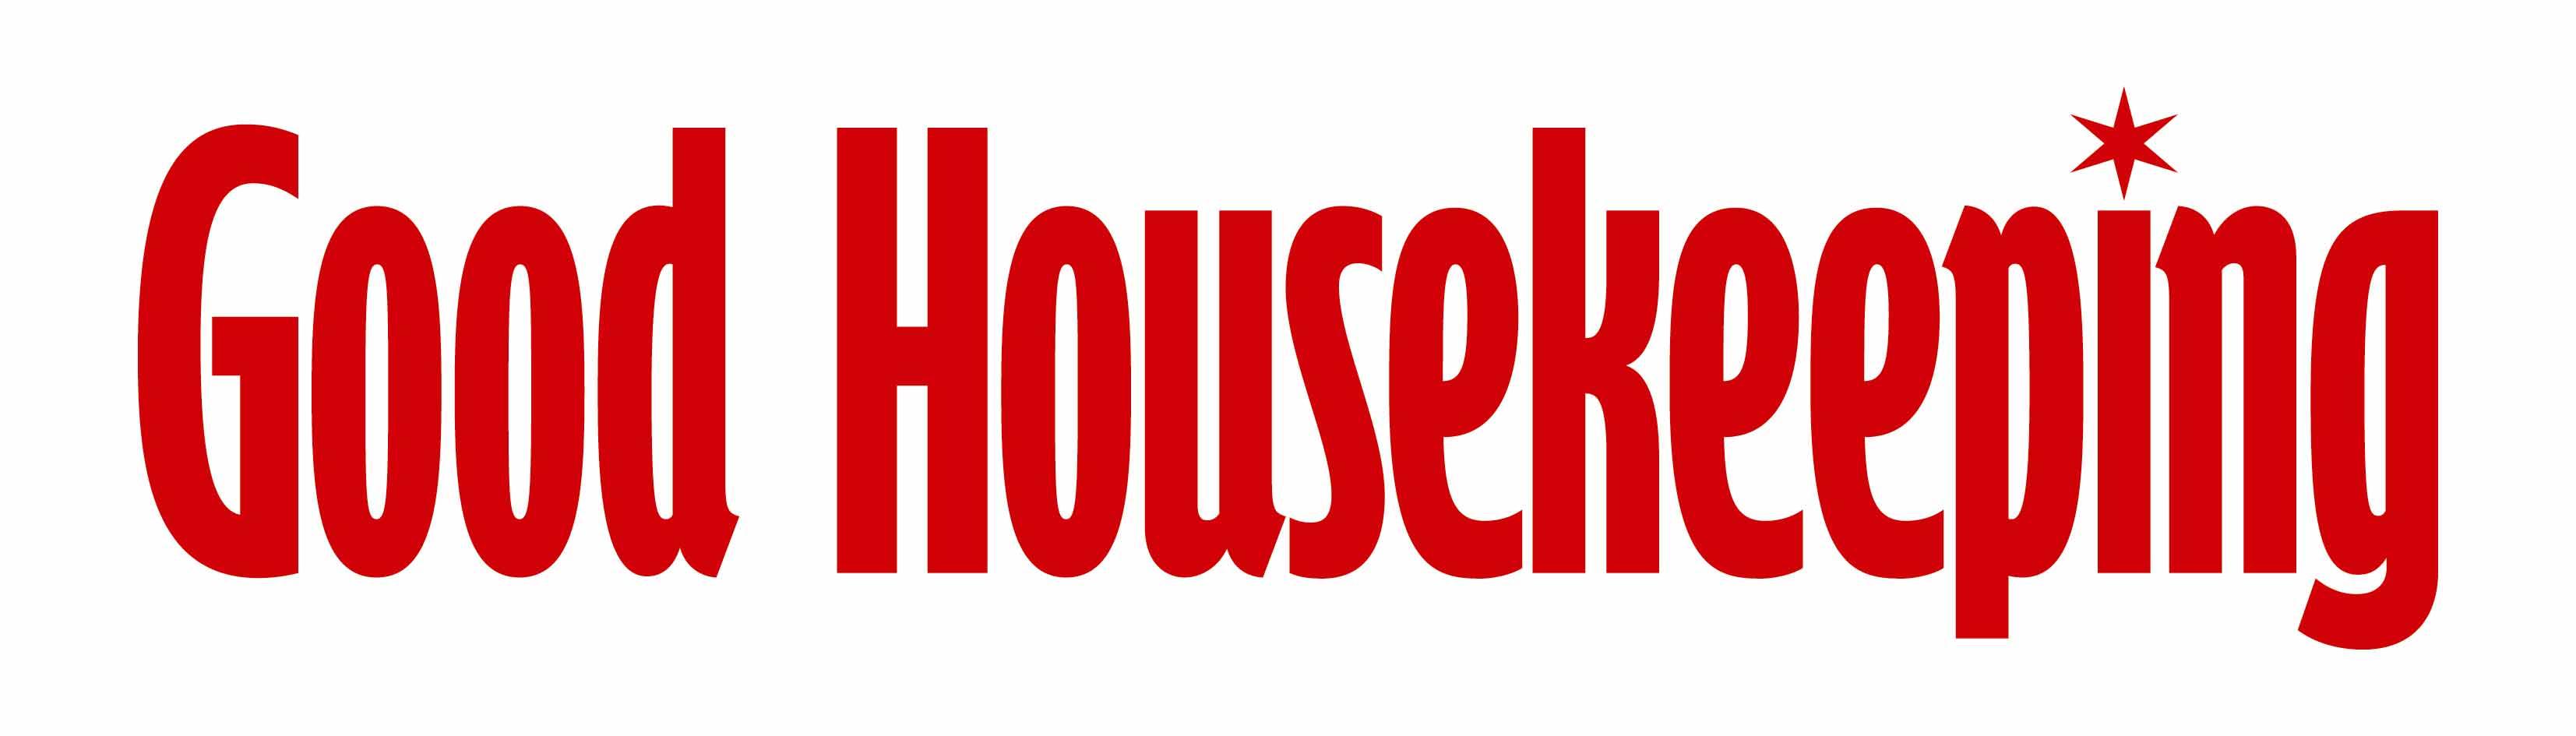 goodhousekeeping.co.uk Logo